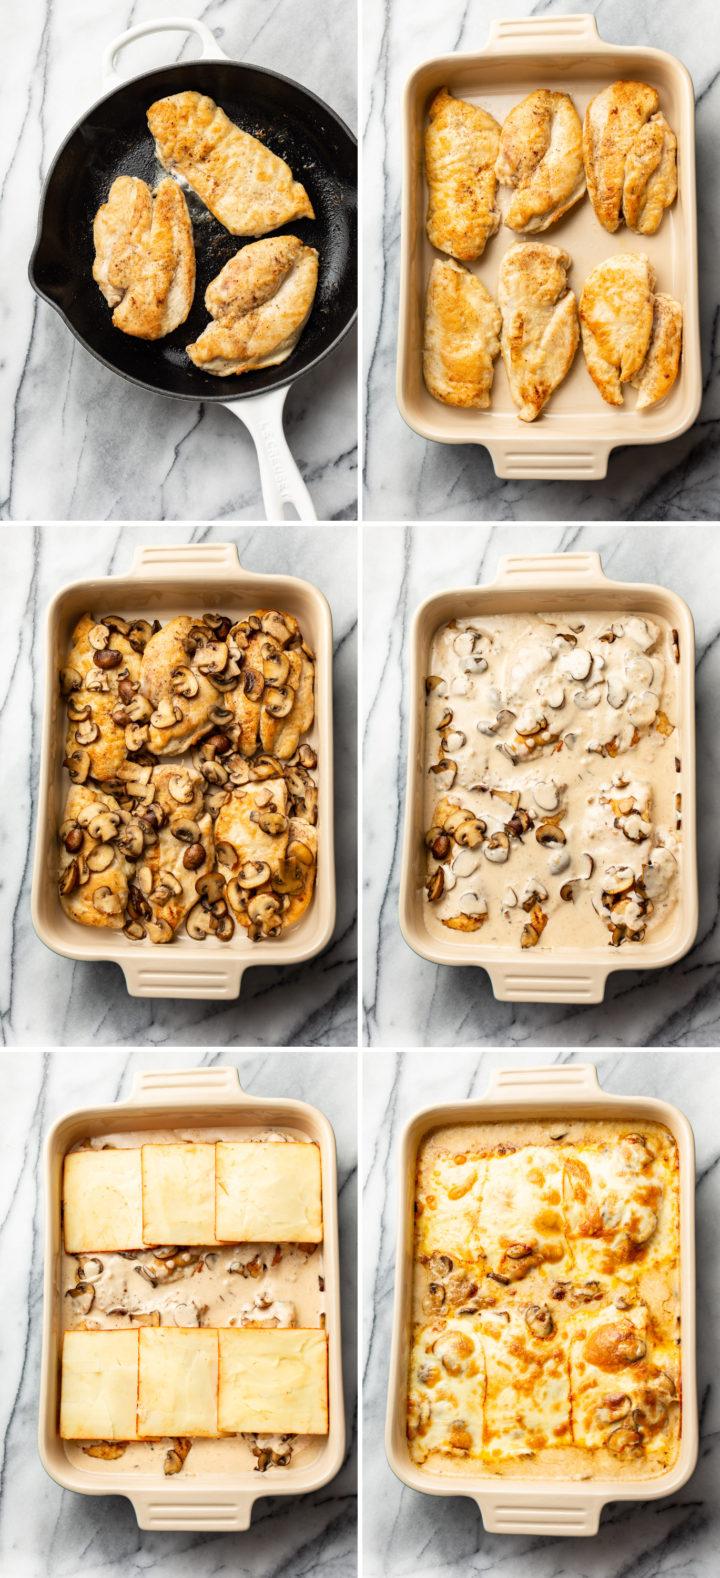 Chicken Gloria process photos collage